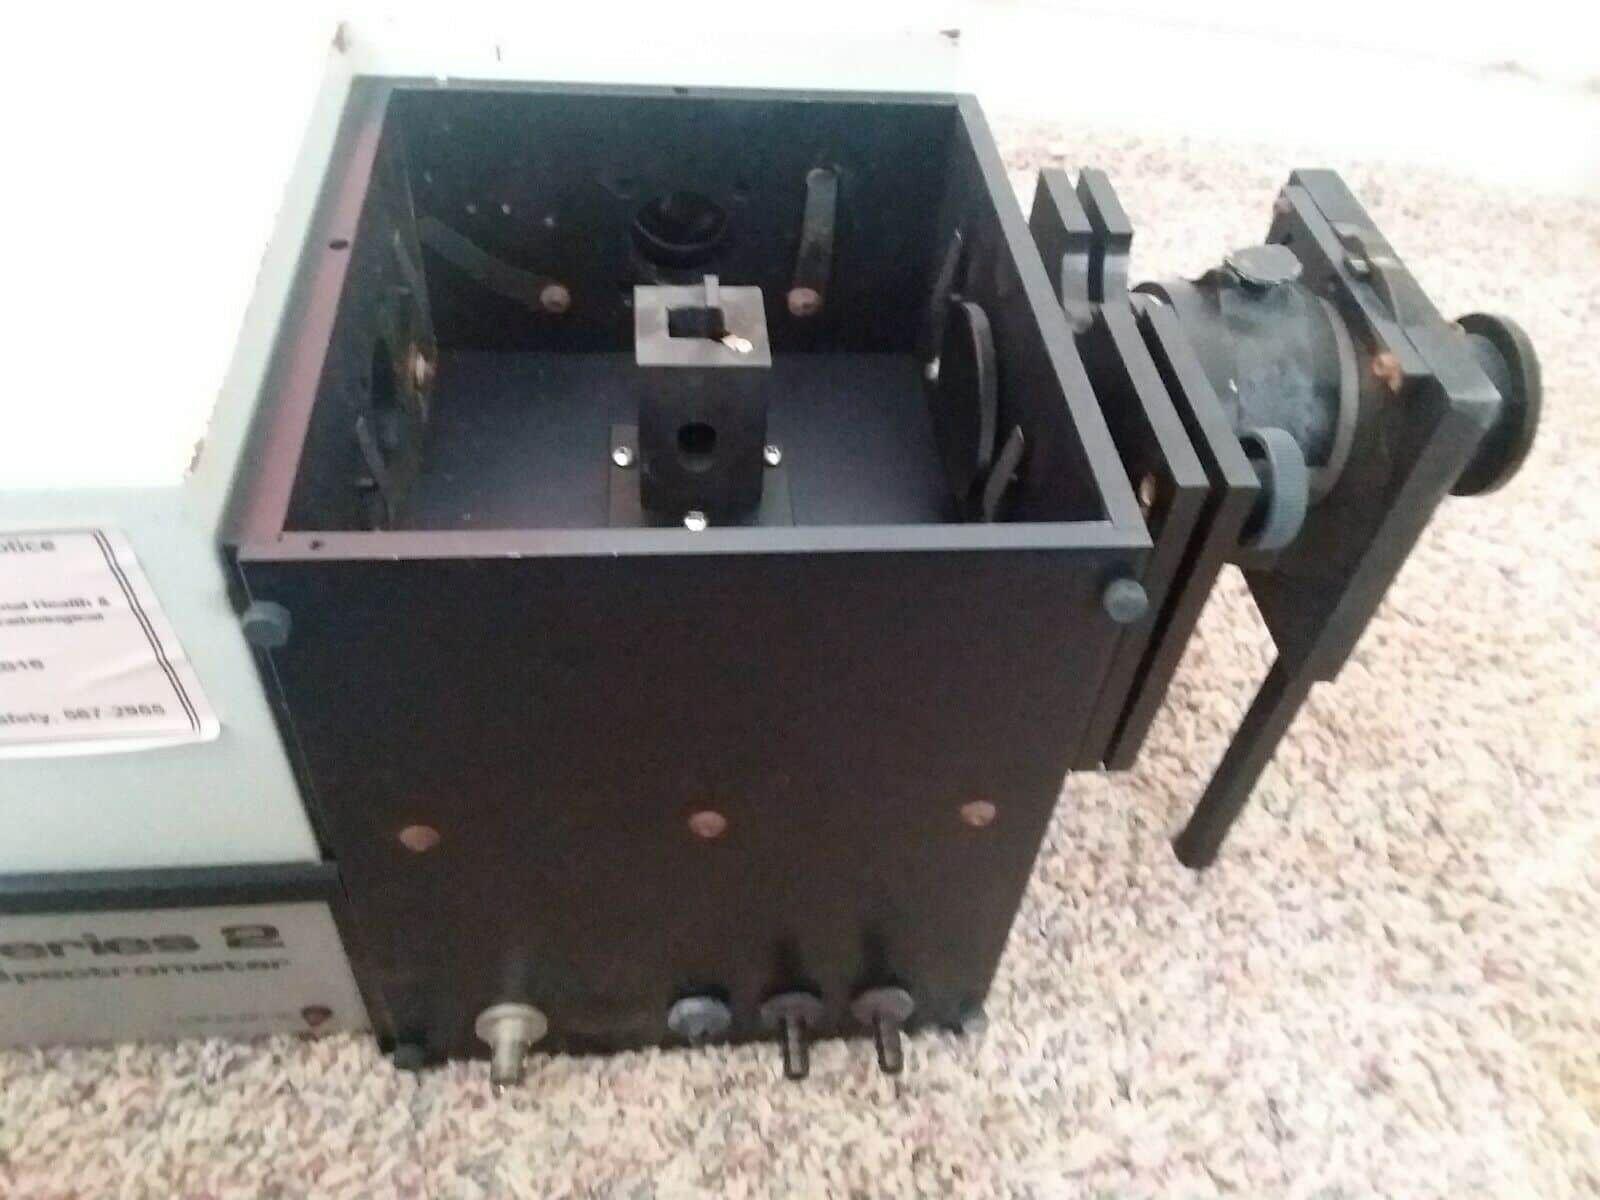 SLM AMINCO BOWMAN SERIES 2 Spectrometer LUMINESCENCE